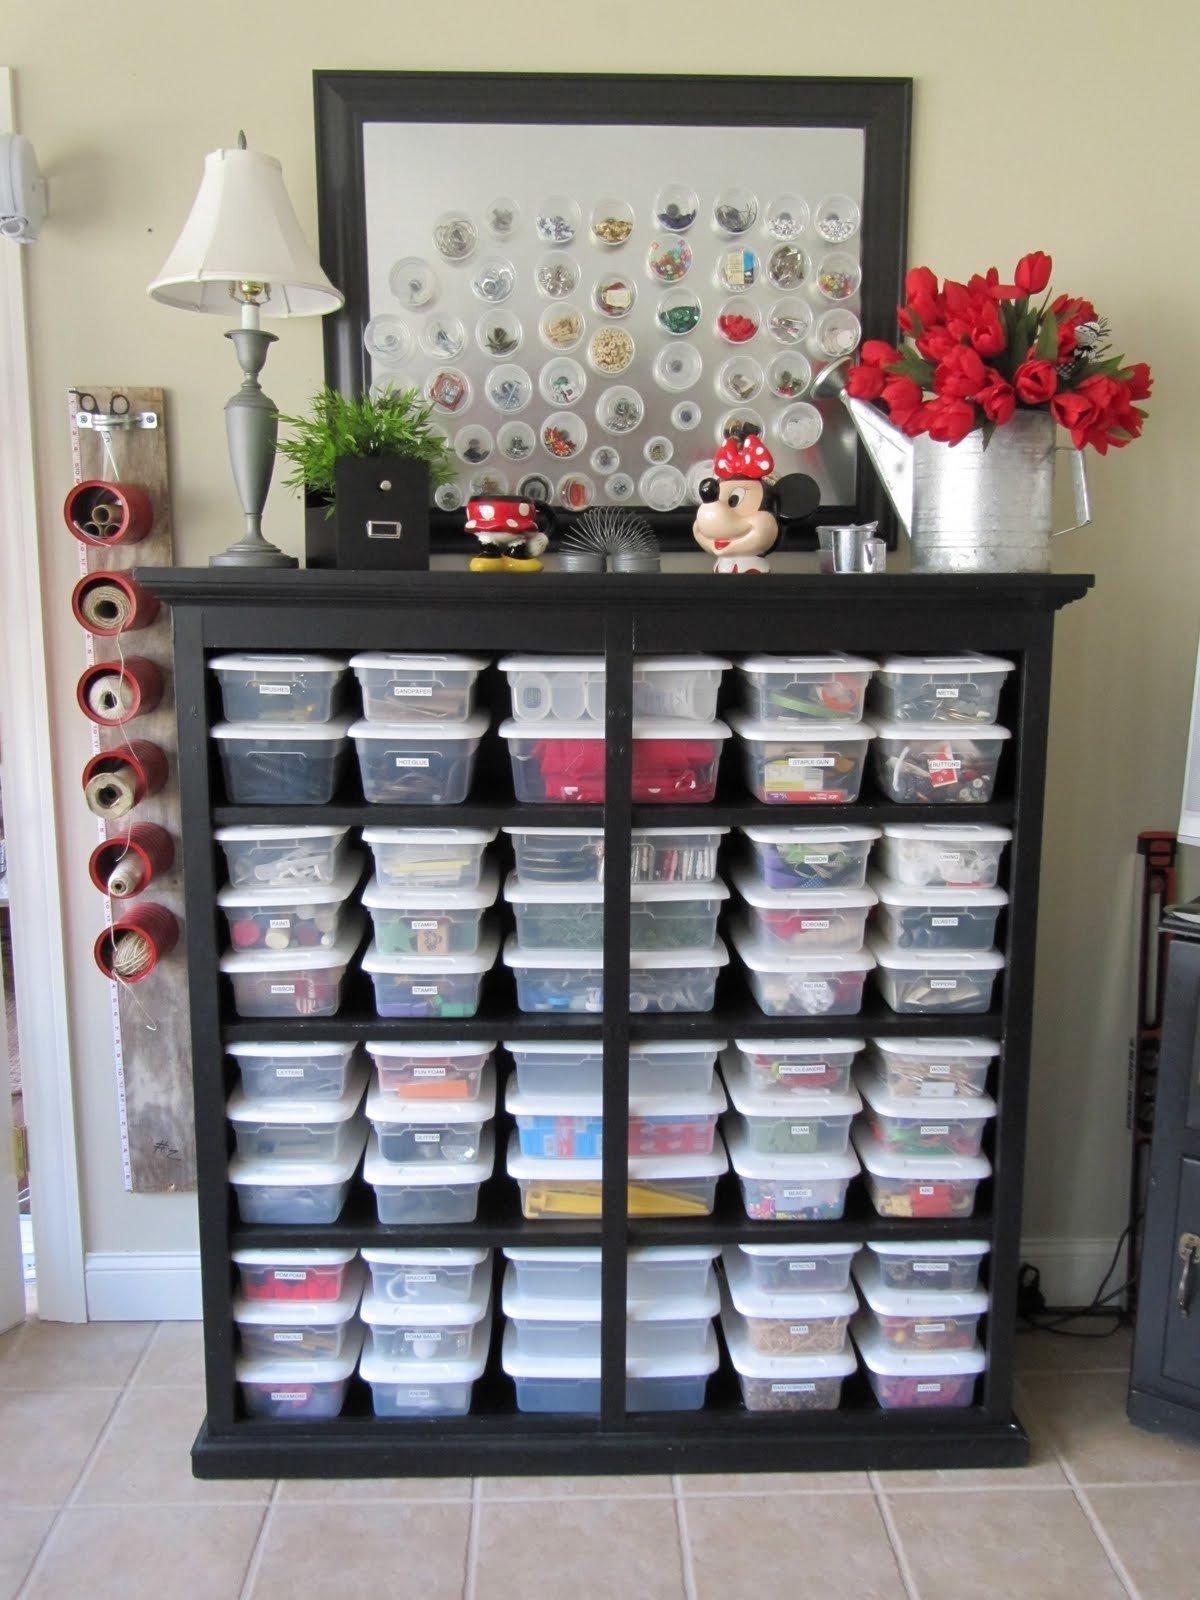 10 Gorgeous Organization Ideas For Small Apartments amazing home office closet organization ideas succor 1200x1600 craft 2021